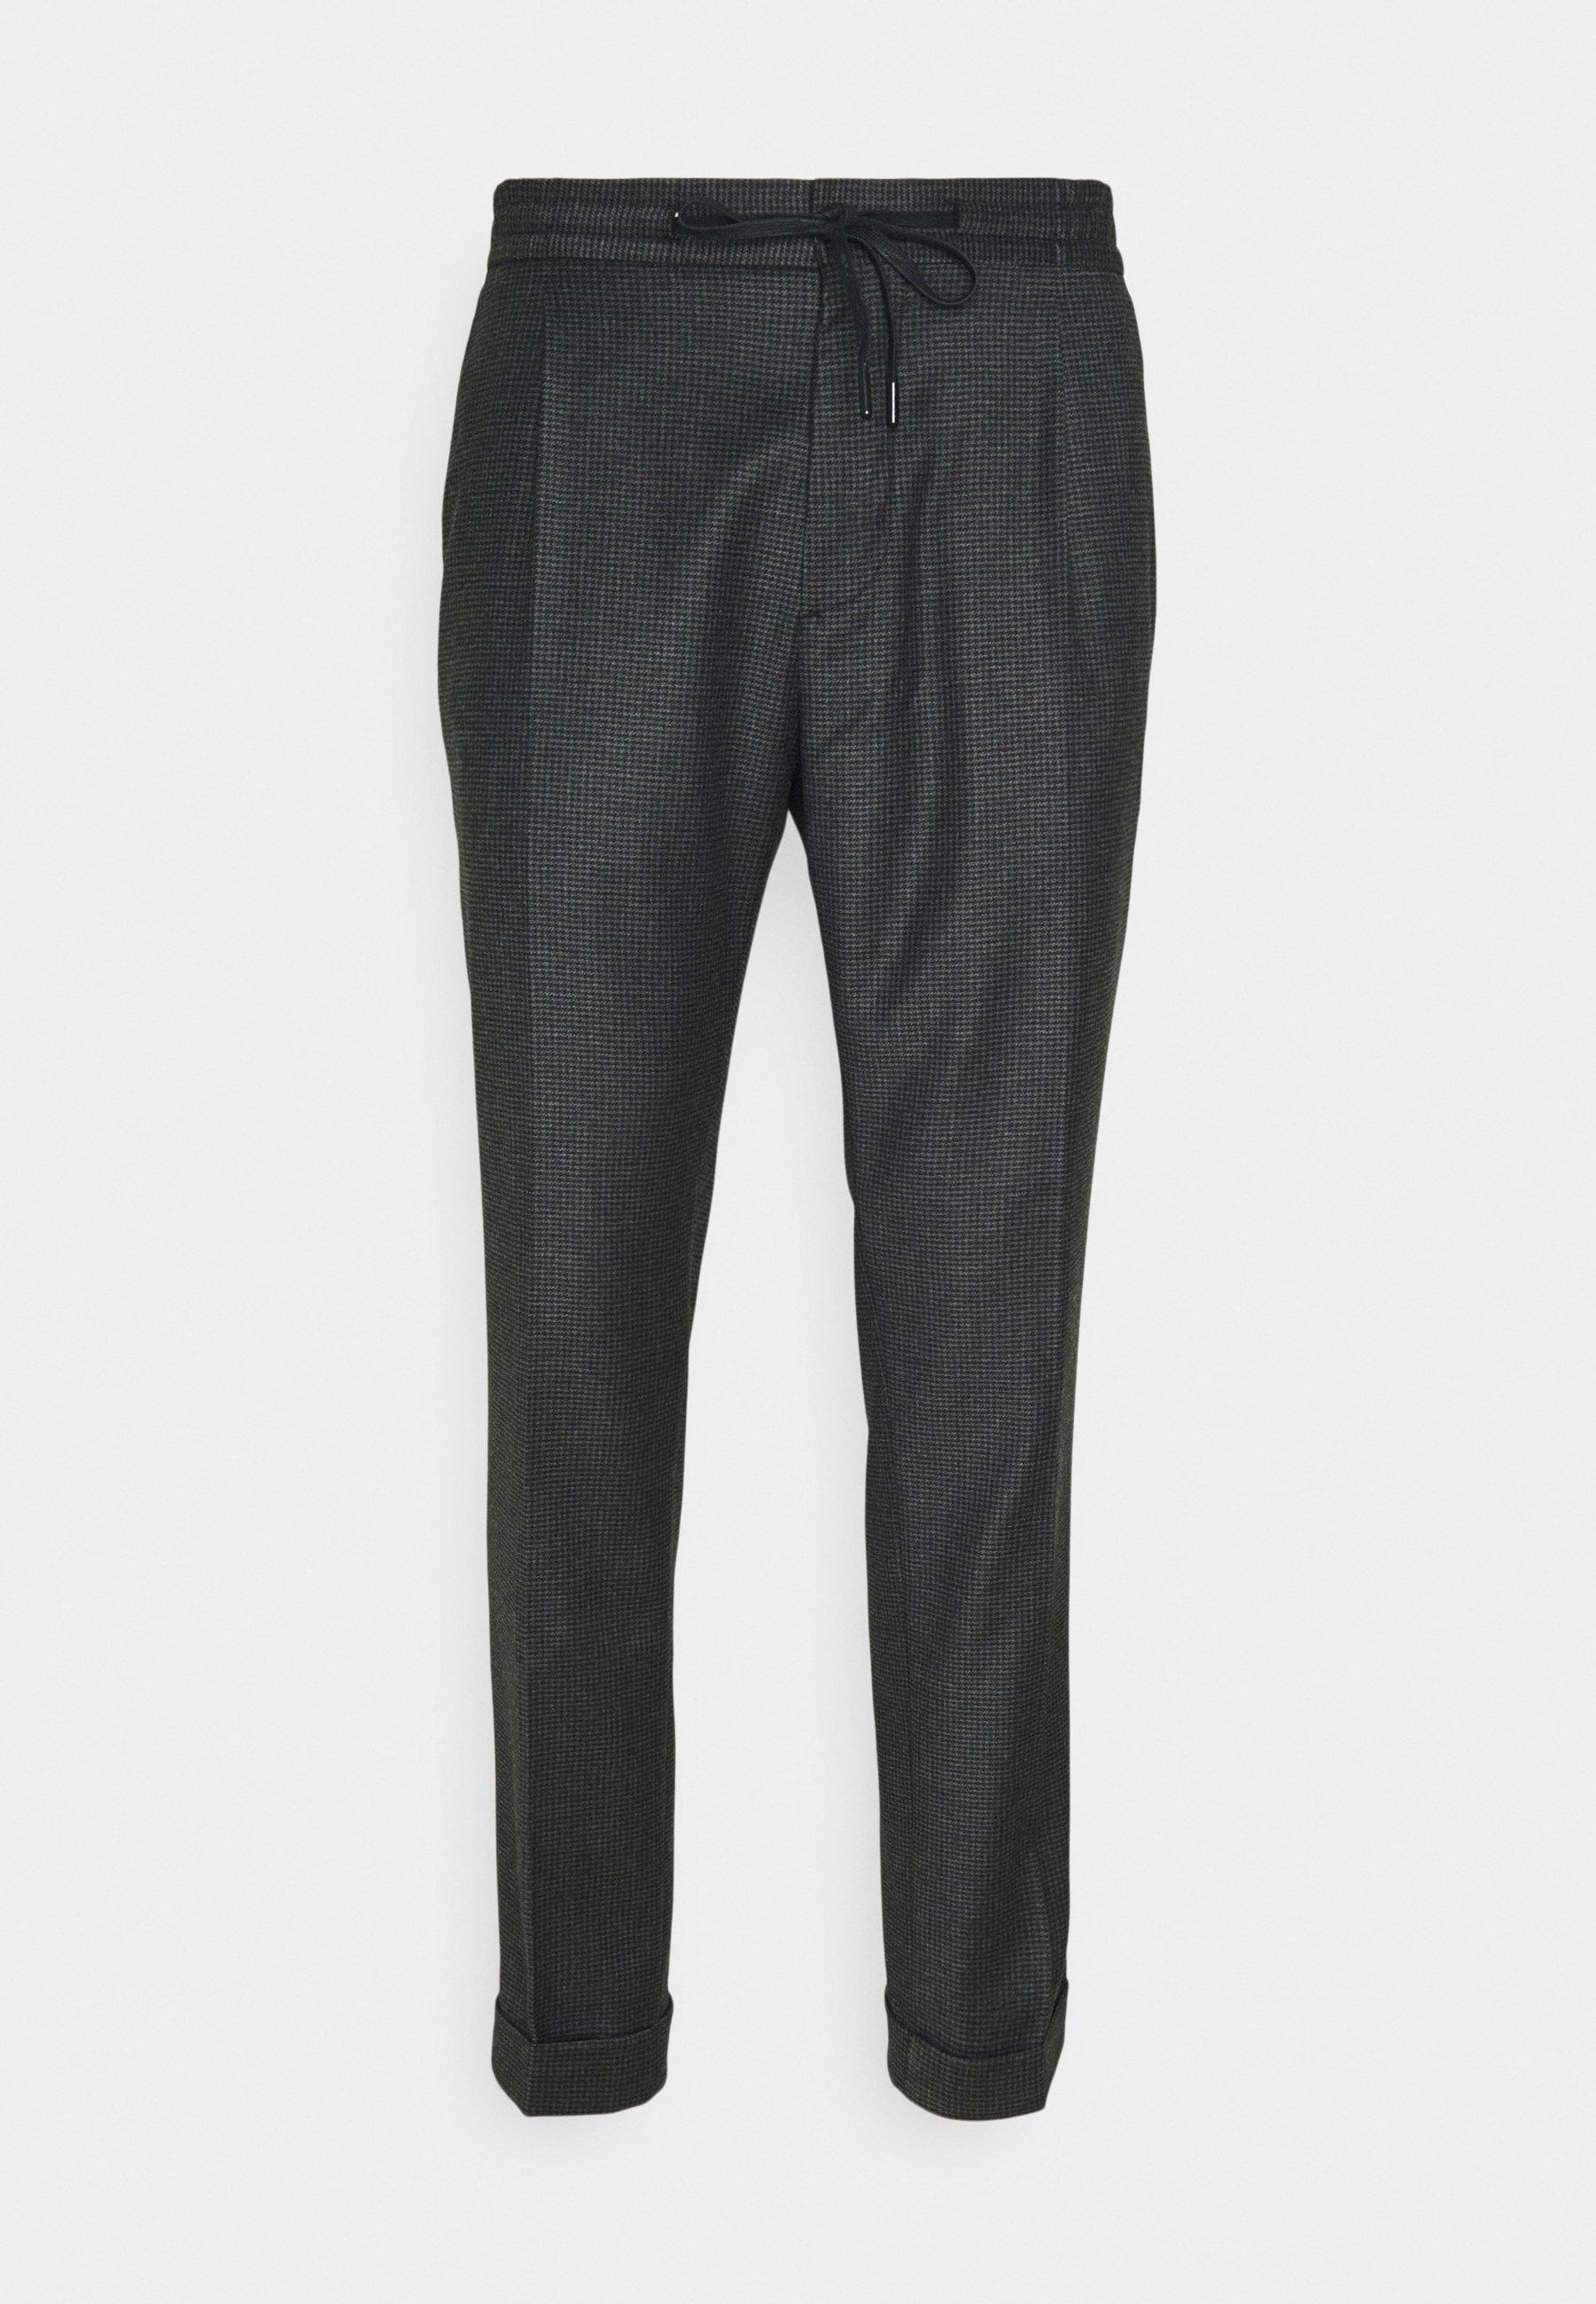 Uomo SASHA PLEATED HOUNDTOOTH PANTS - Pantaloni